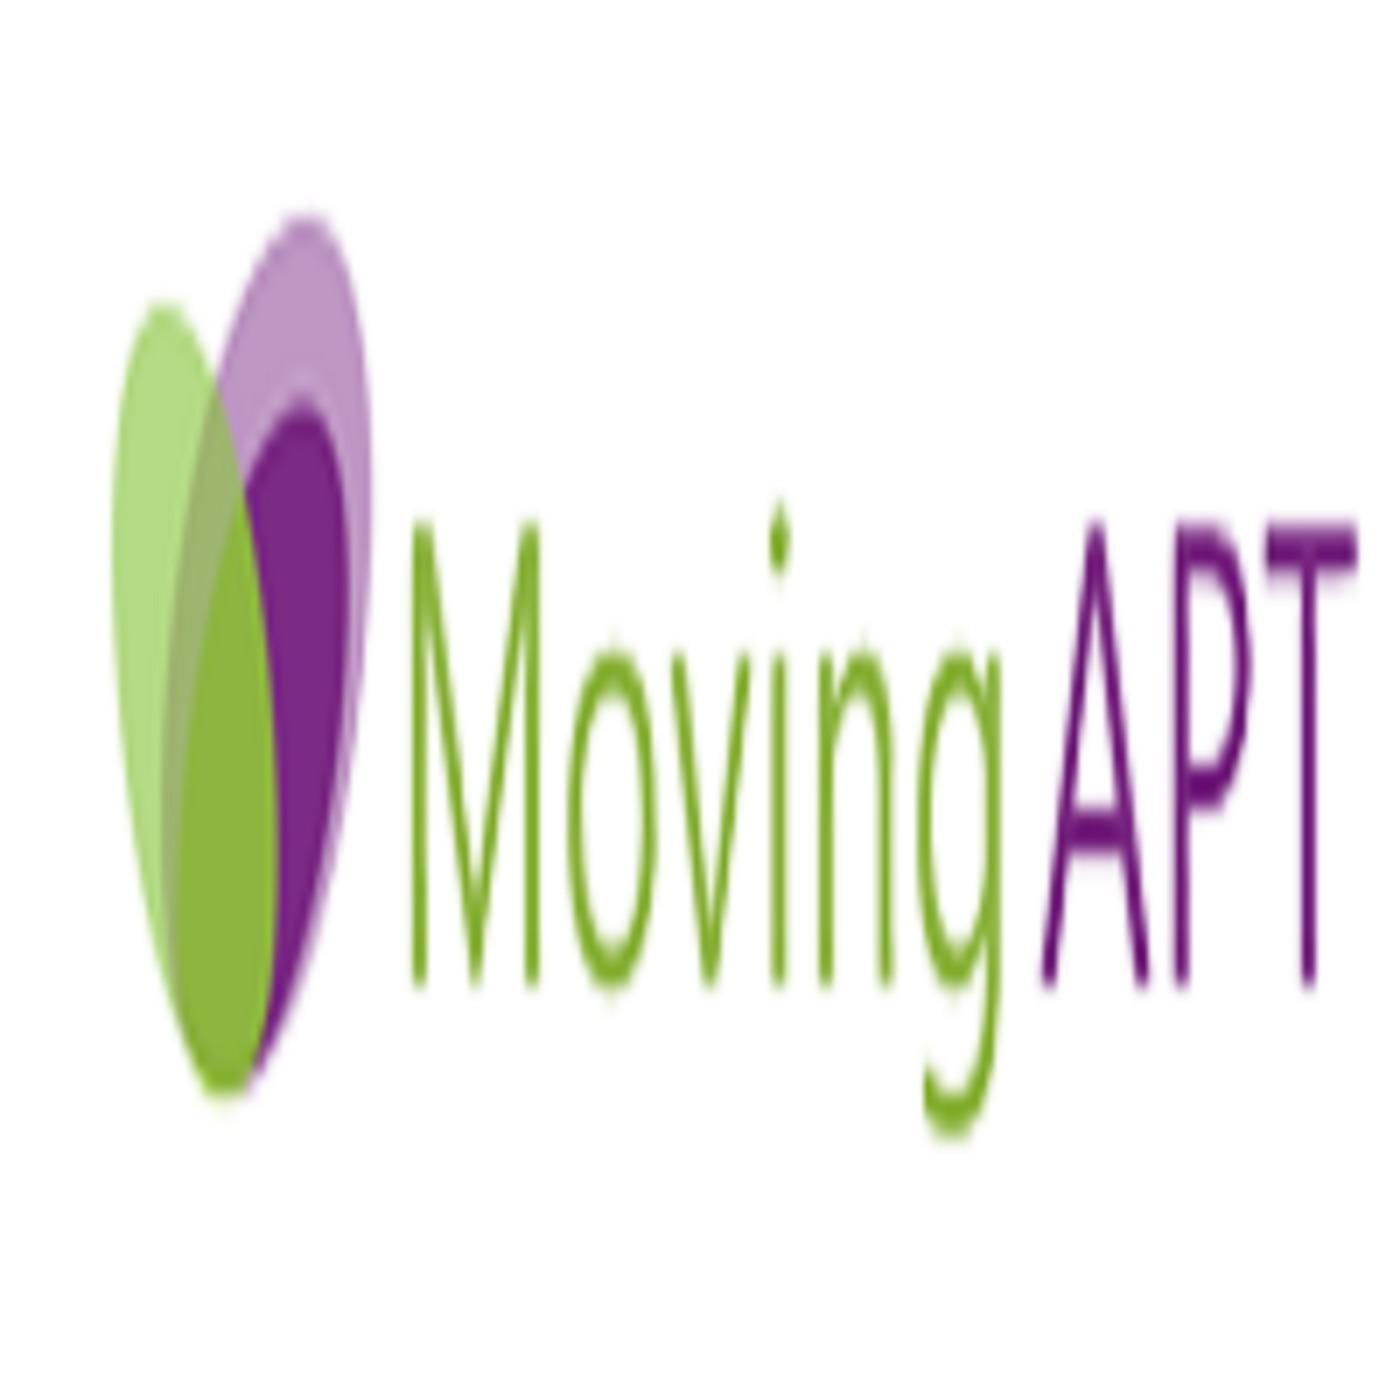 Moving Company Near Me - Moving APT (@movingapt1) Cover Image